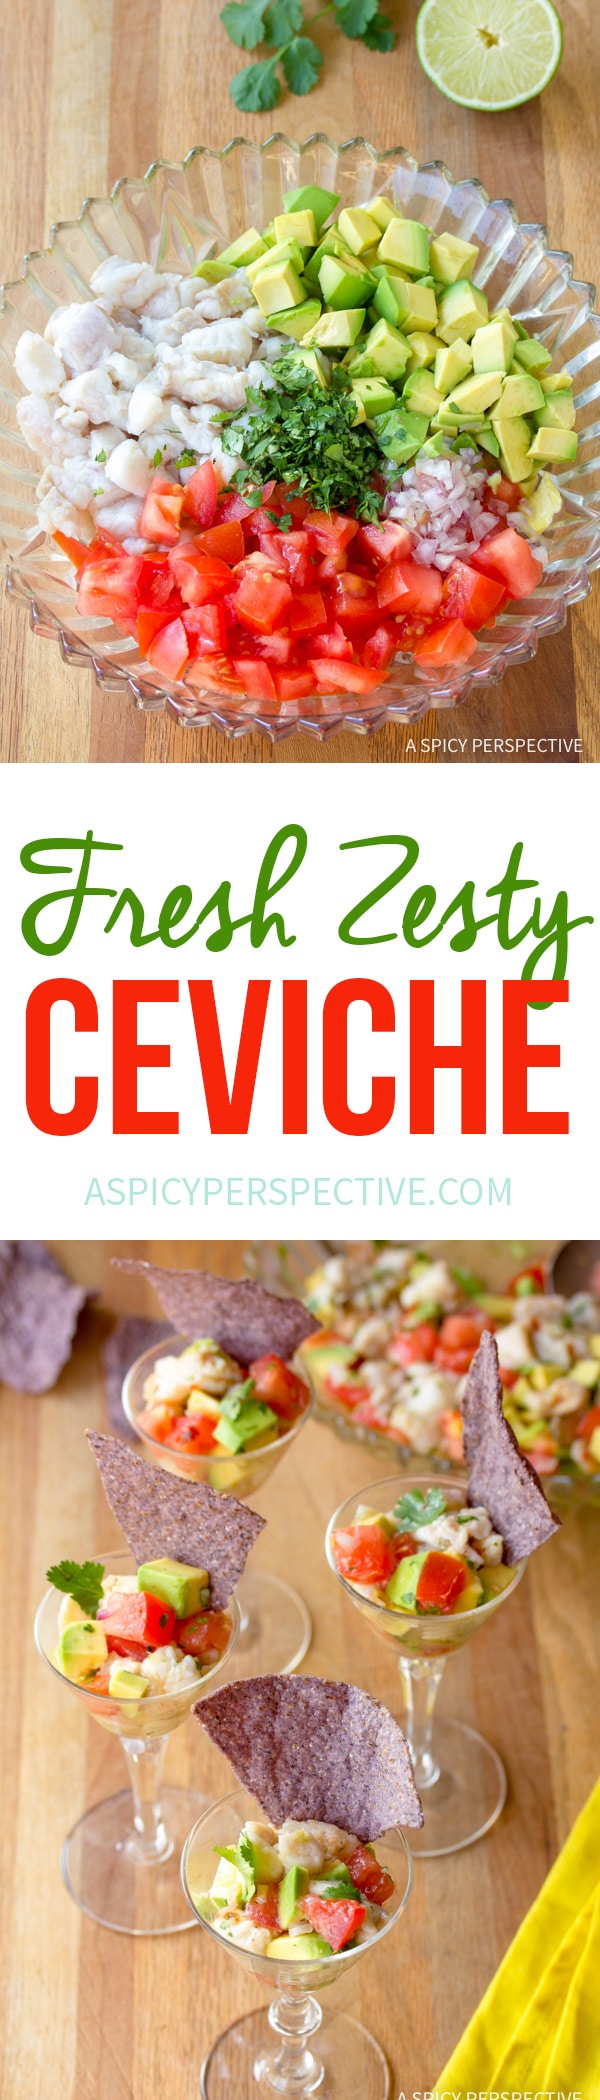 Zesty Classic Ceviche Recipe #healthy #lowcarb #paleo